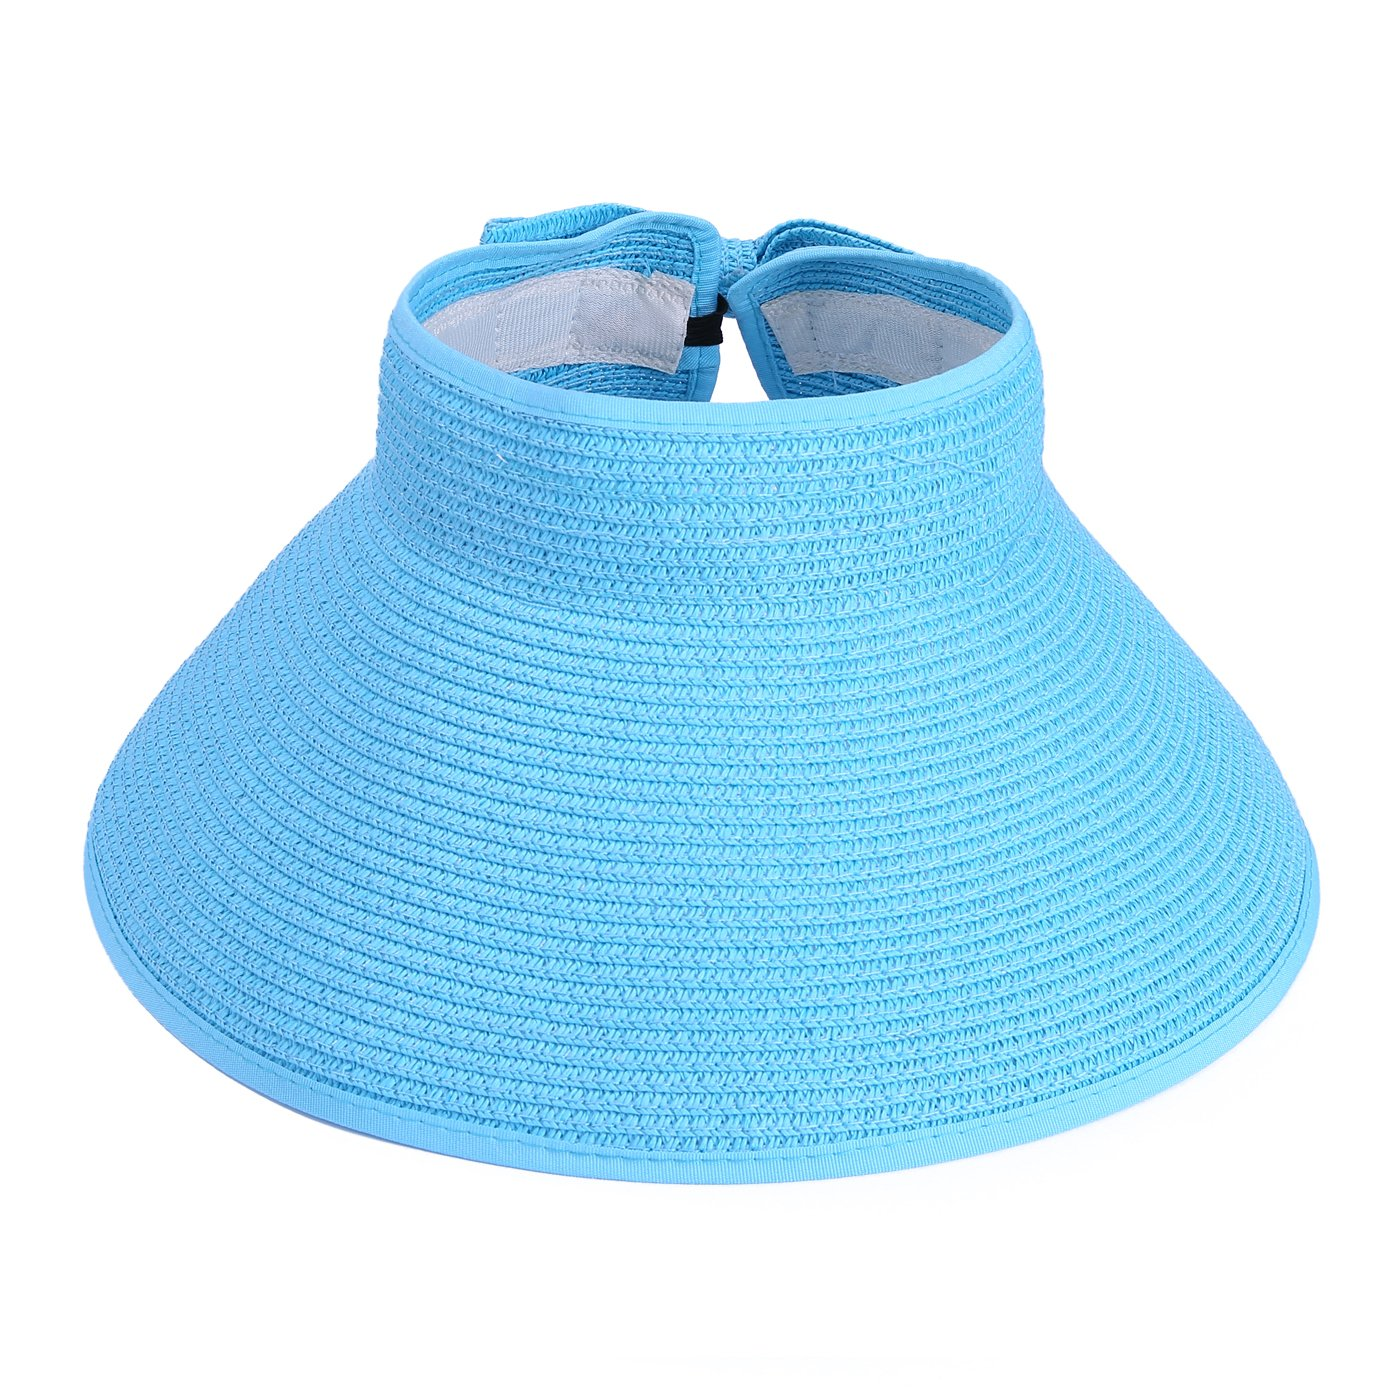 7eab4a2264487 HDE Women UPF 50+ Packable Crushable Roll Up Wide Brim Sun Visor Beach  Straw Hat